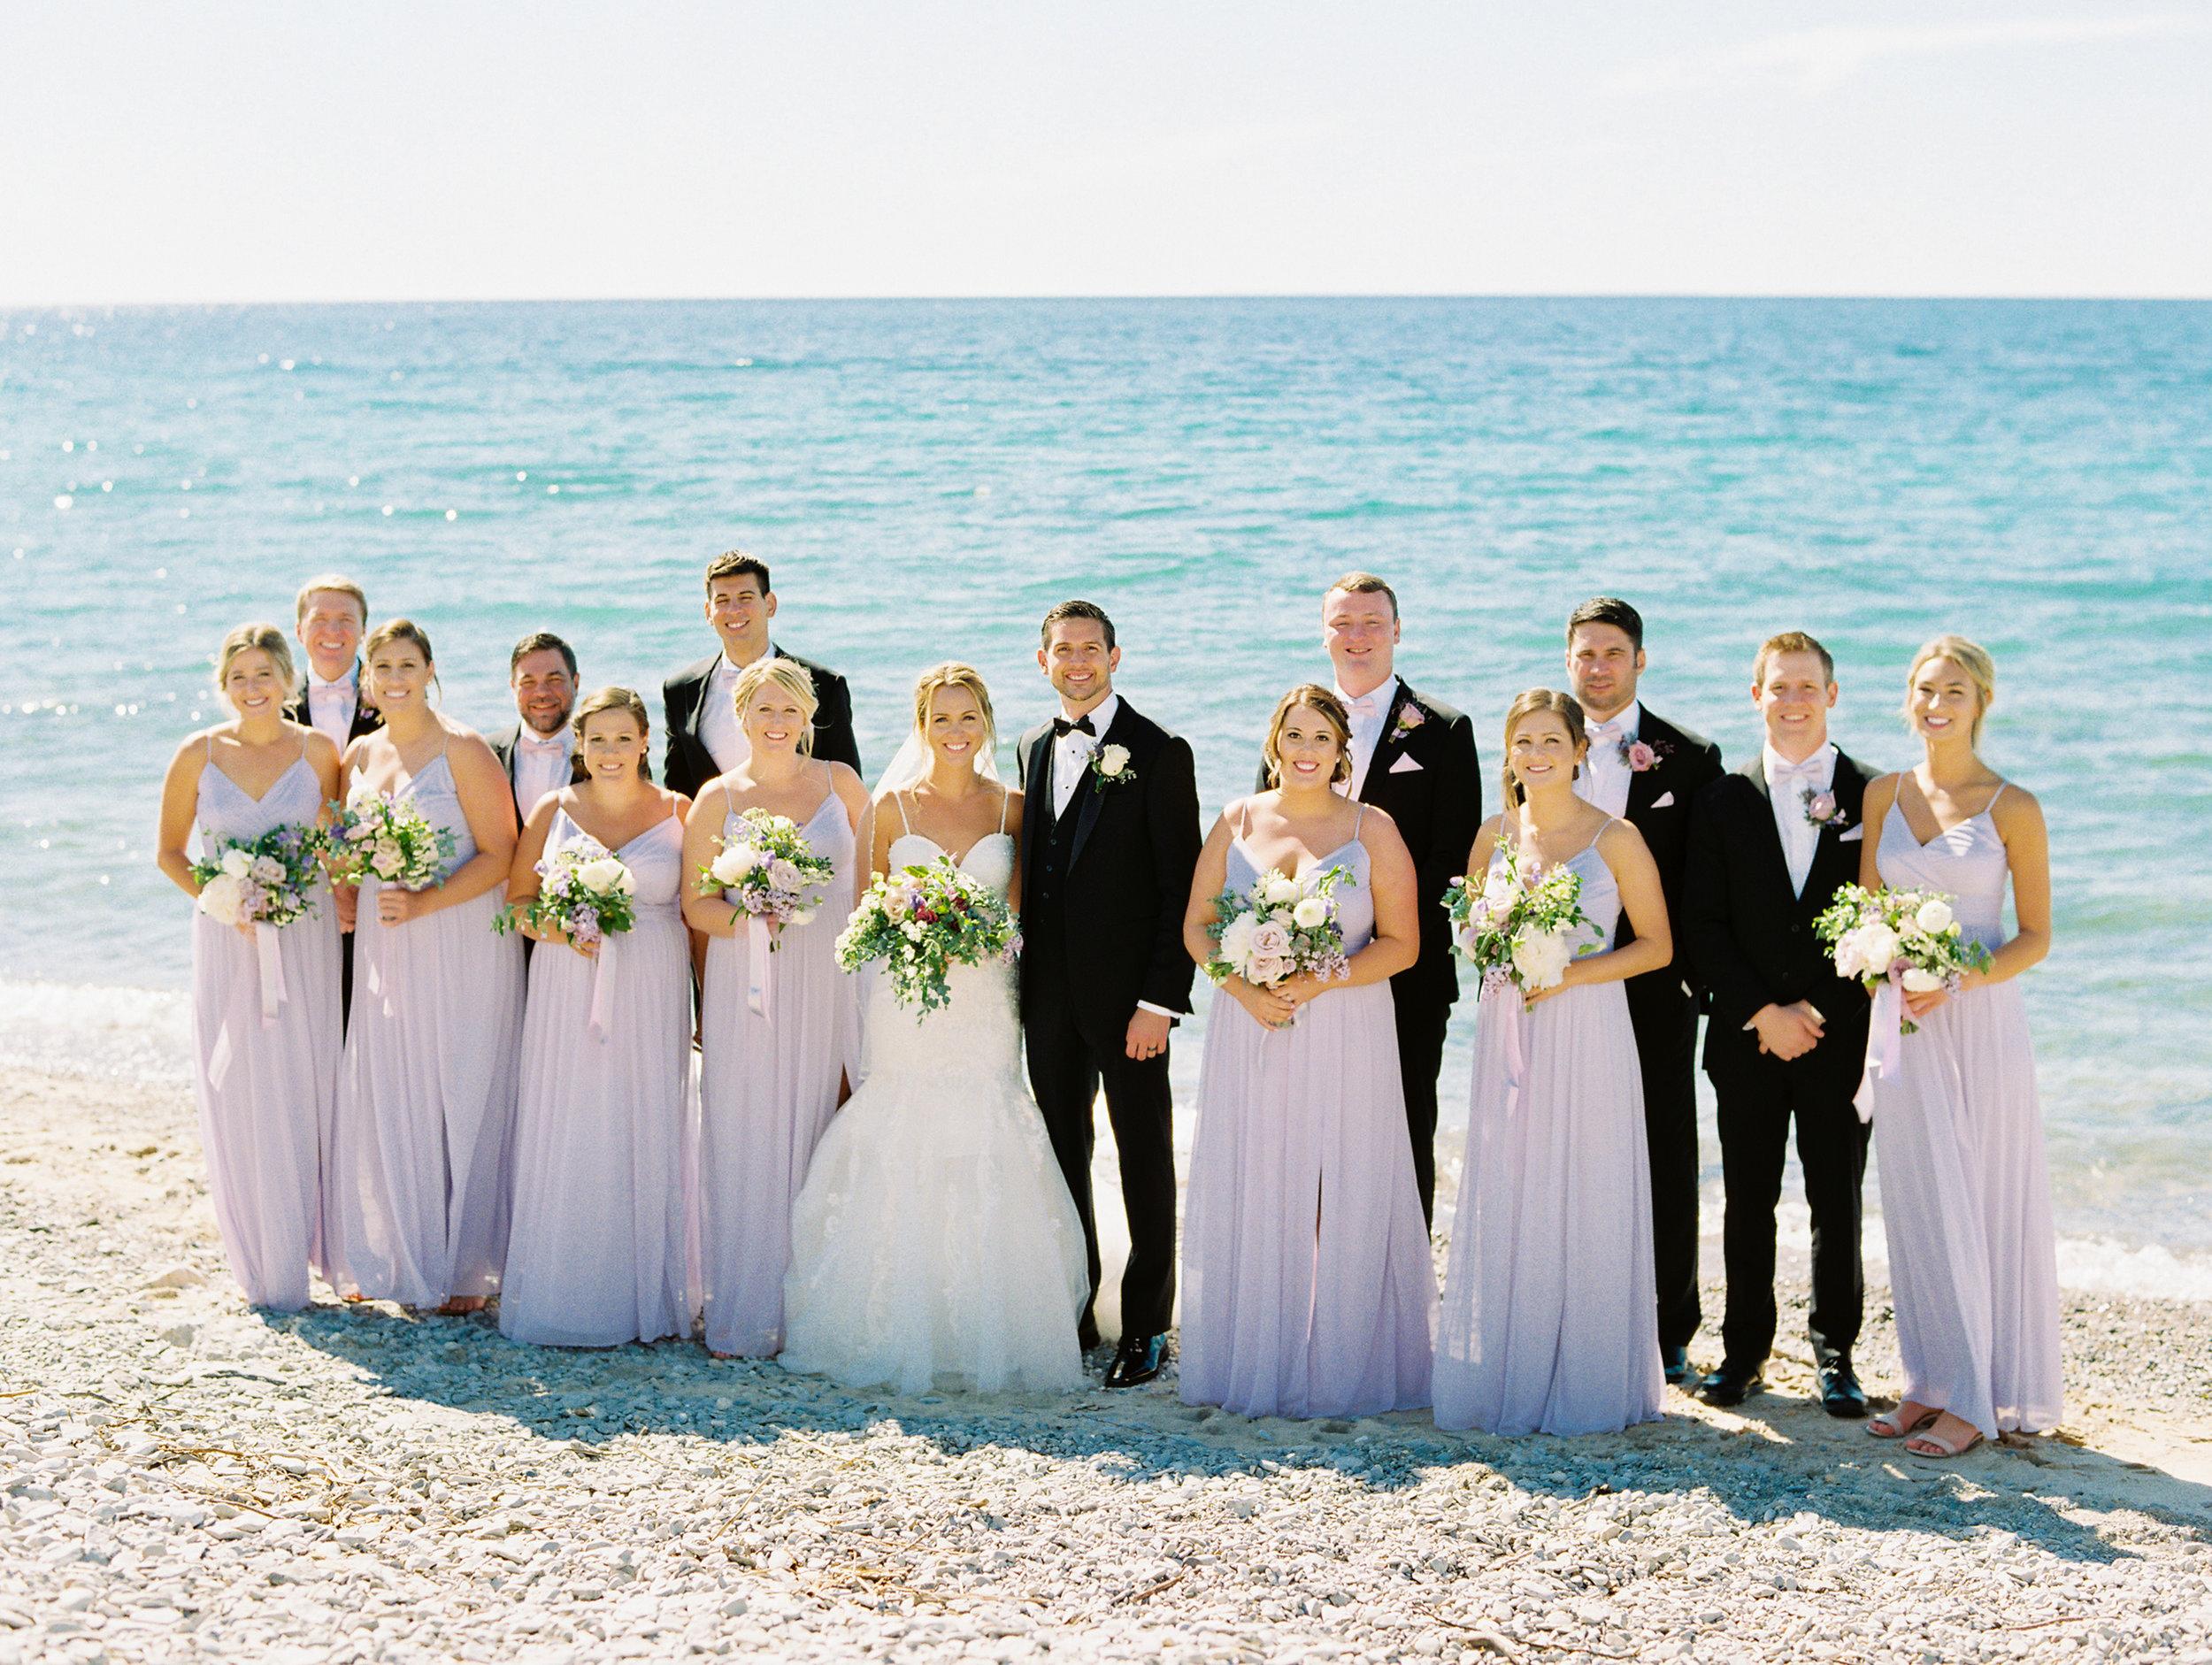 Noss+Wedding+Bridal+Party-25.jpg